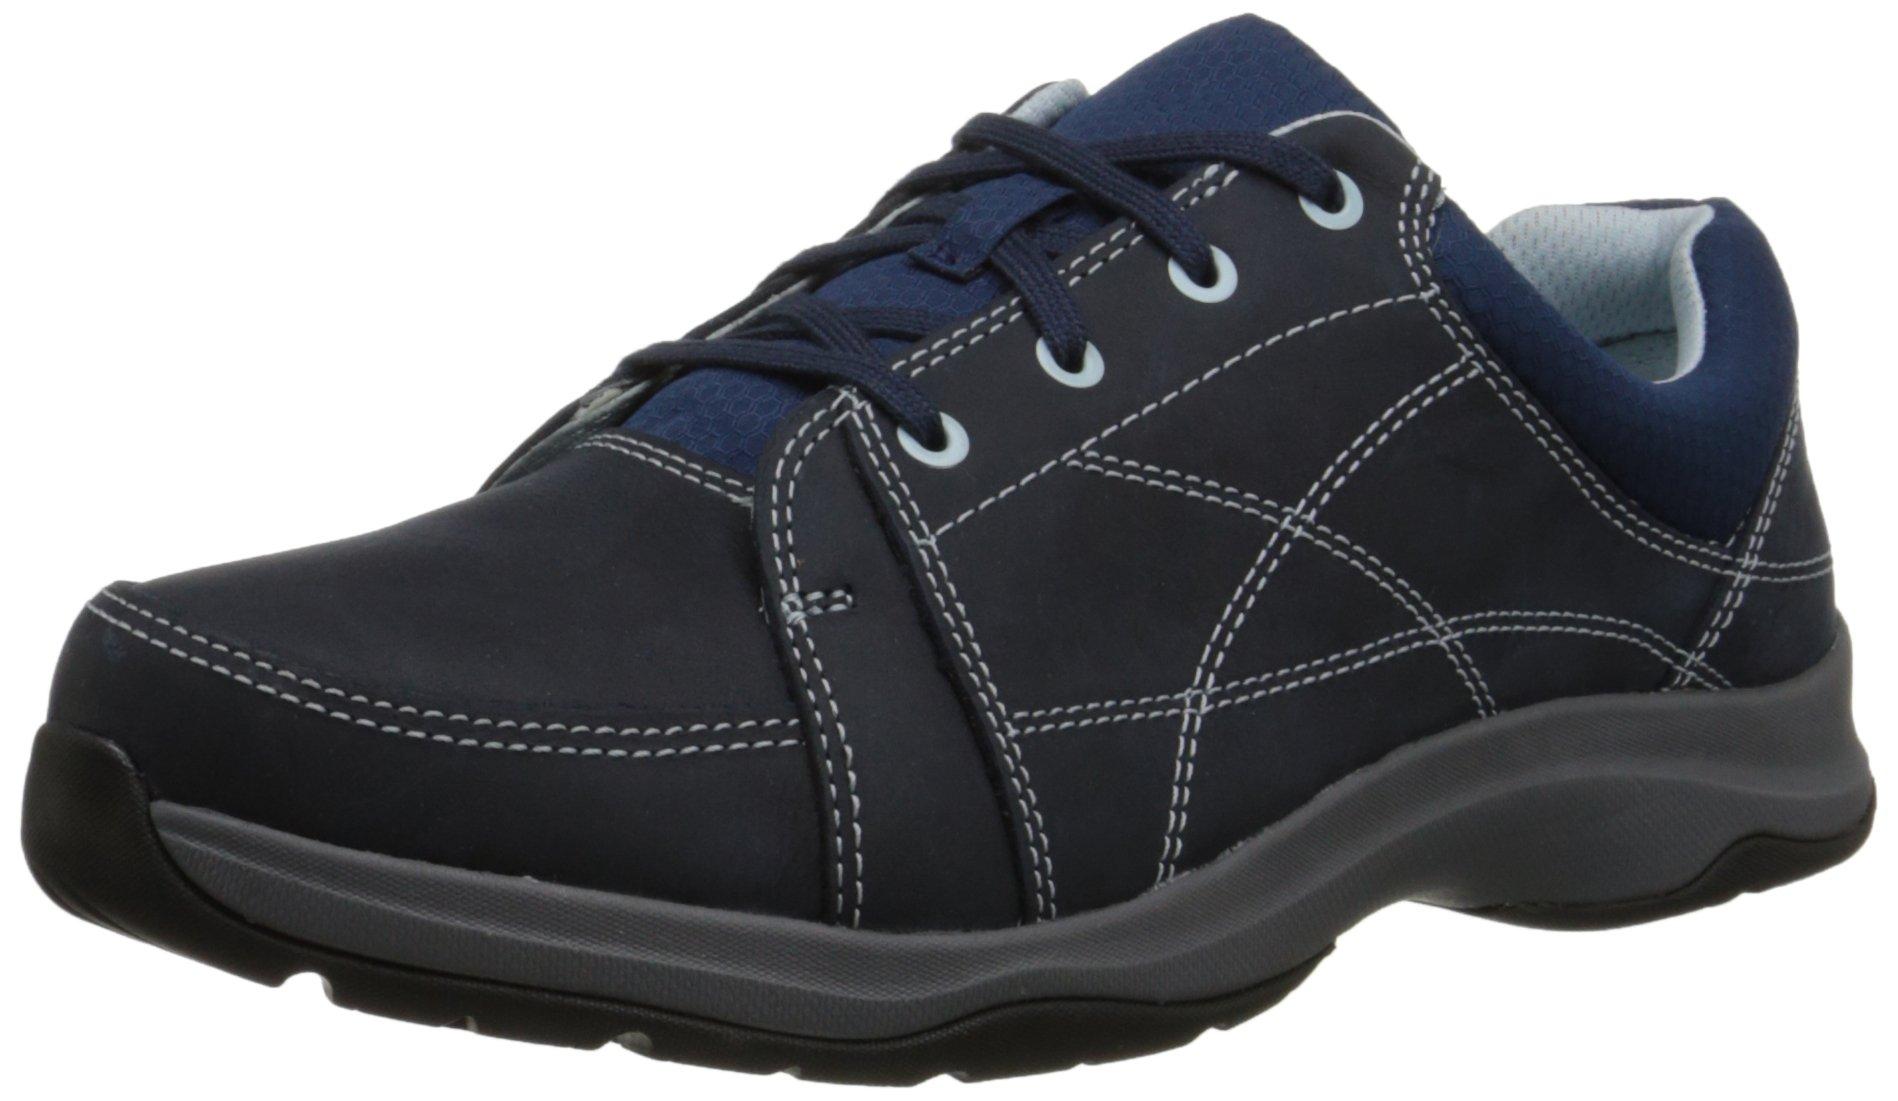 Ahnu Women's Taraval Walking Shoe, Dress Blue, 10 M US